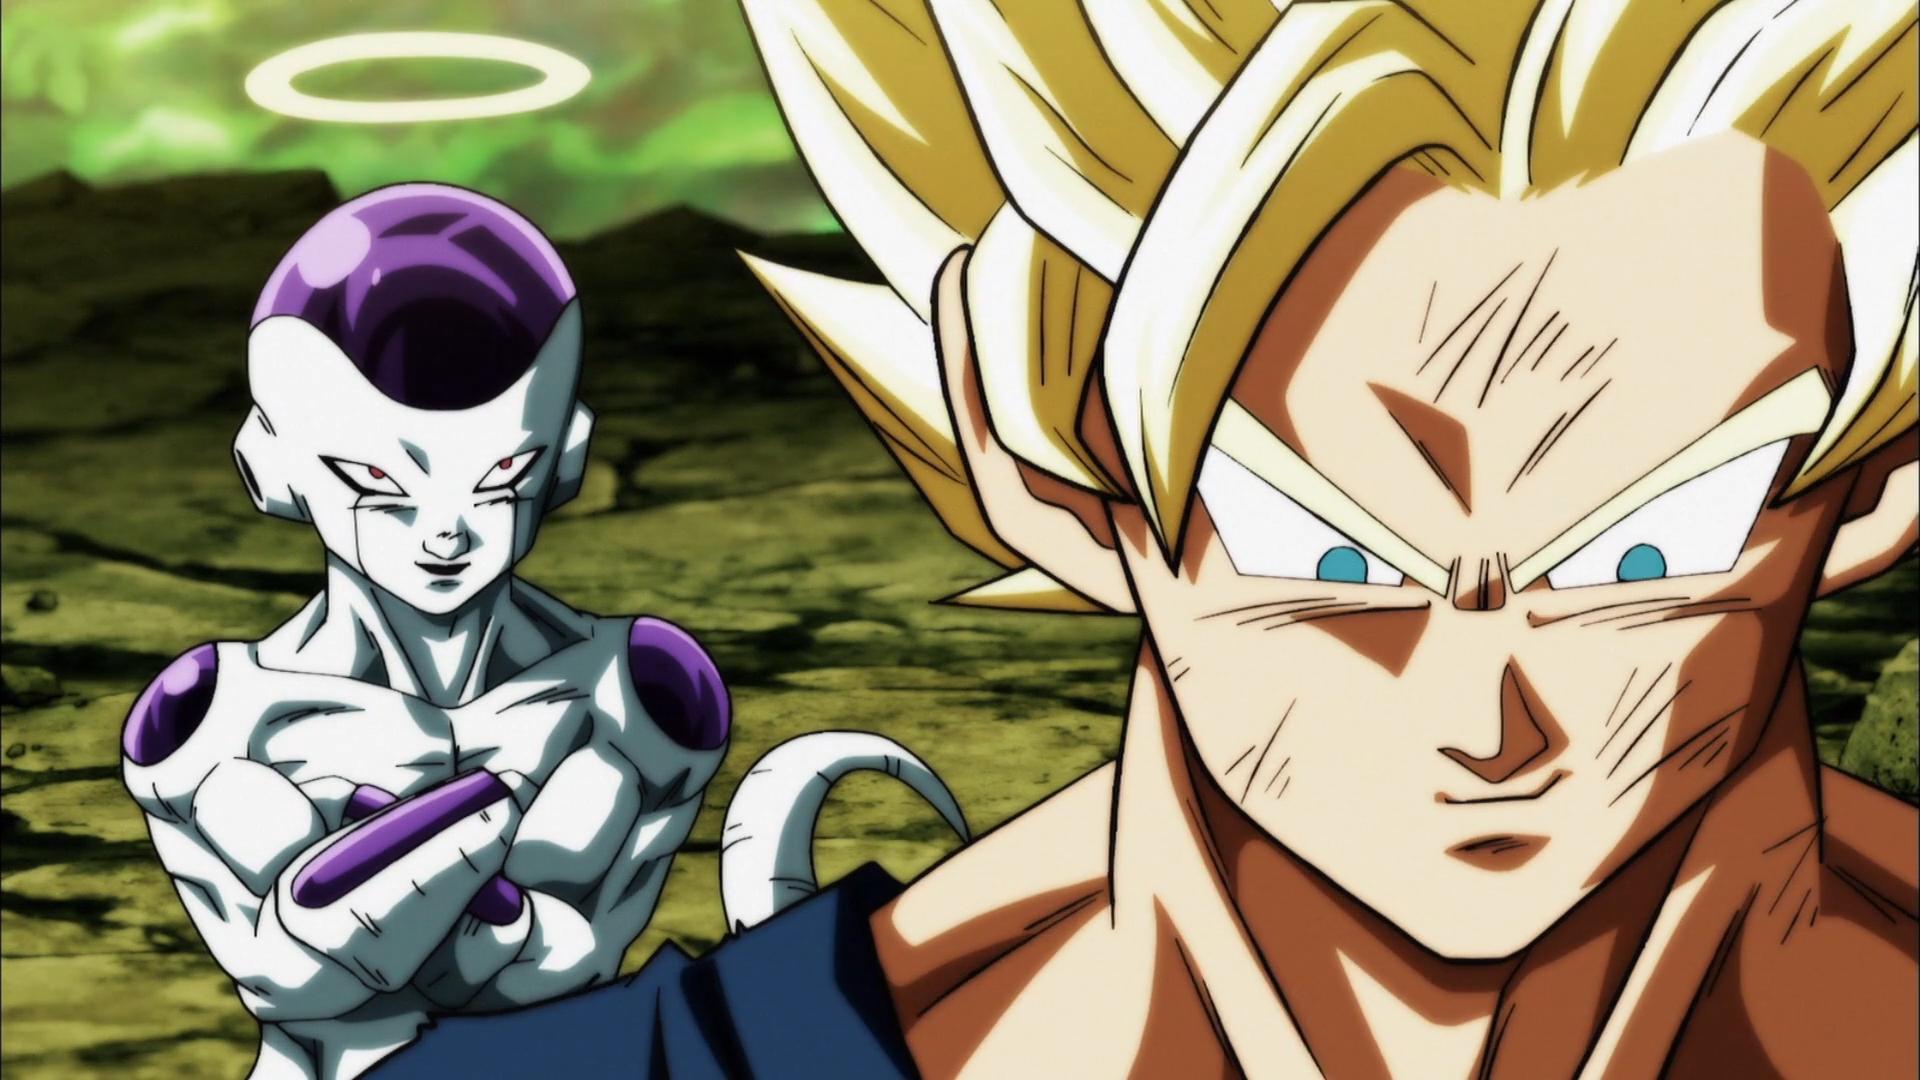 Son Goku And Freezer Goku Ssj2 Vs Kale And Caulifla 1058232